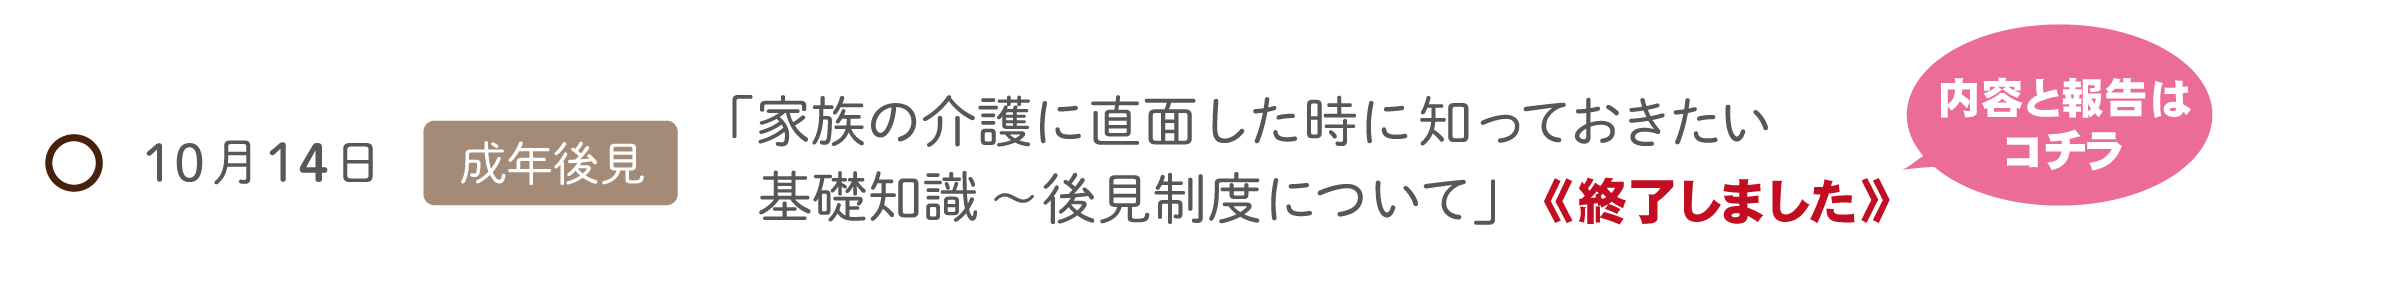 10gatusyuuryou